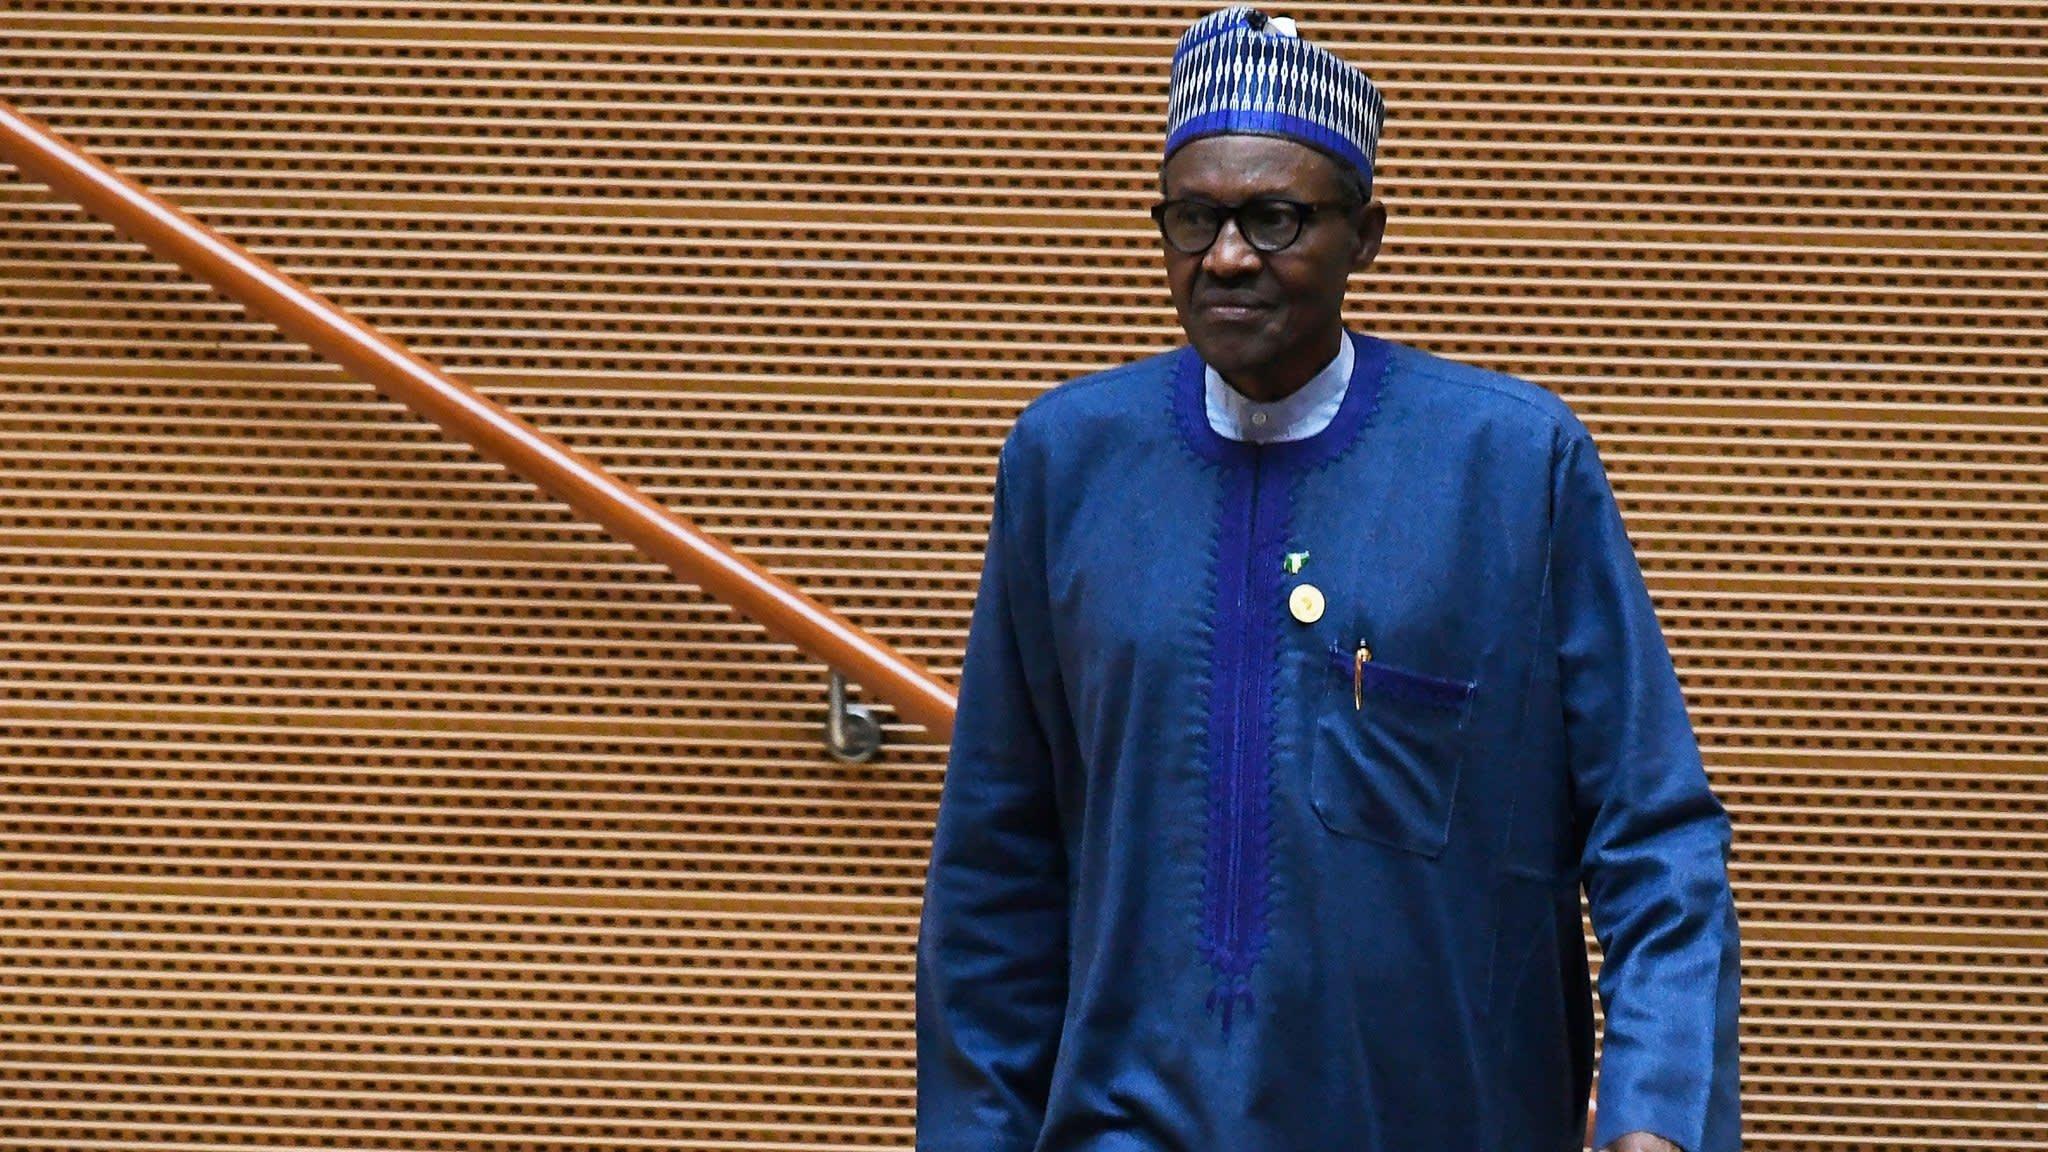 Elder statesmen urge Nigeria's Buhari not to run for second term